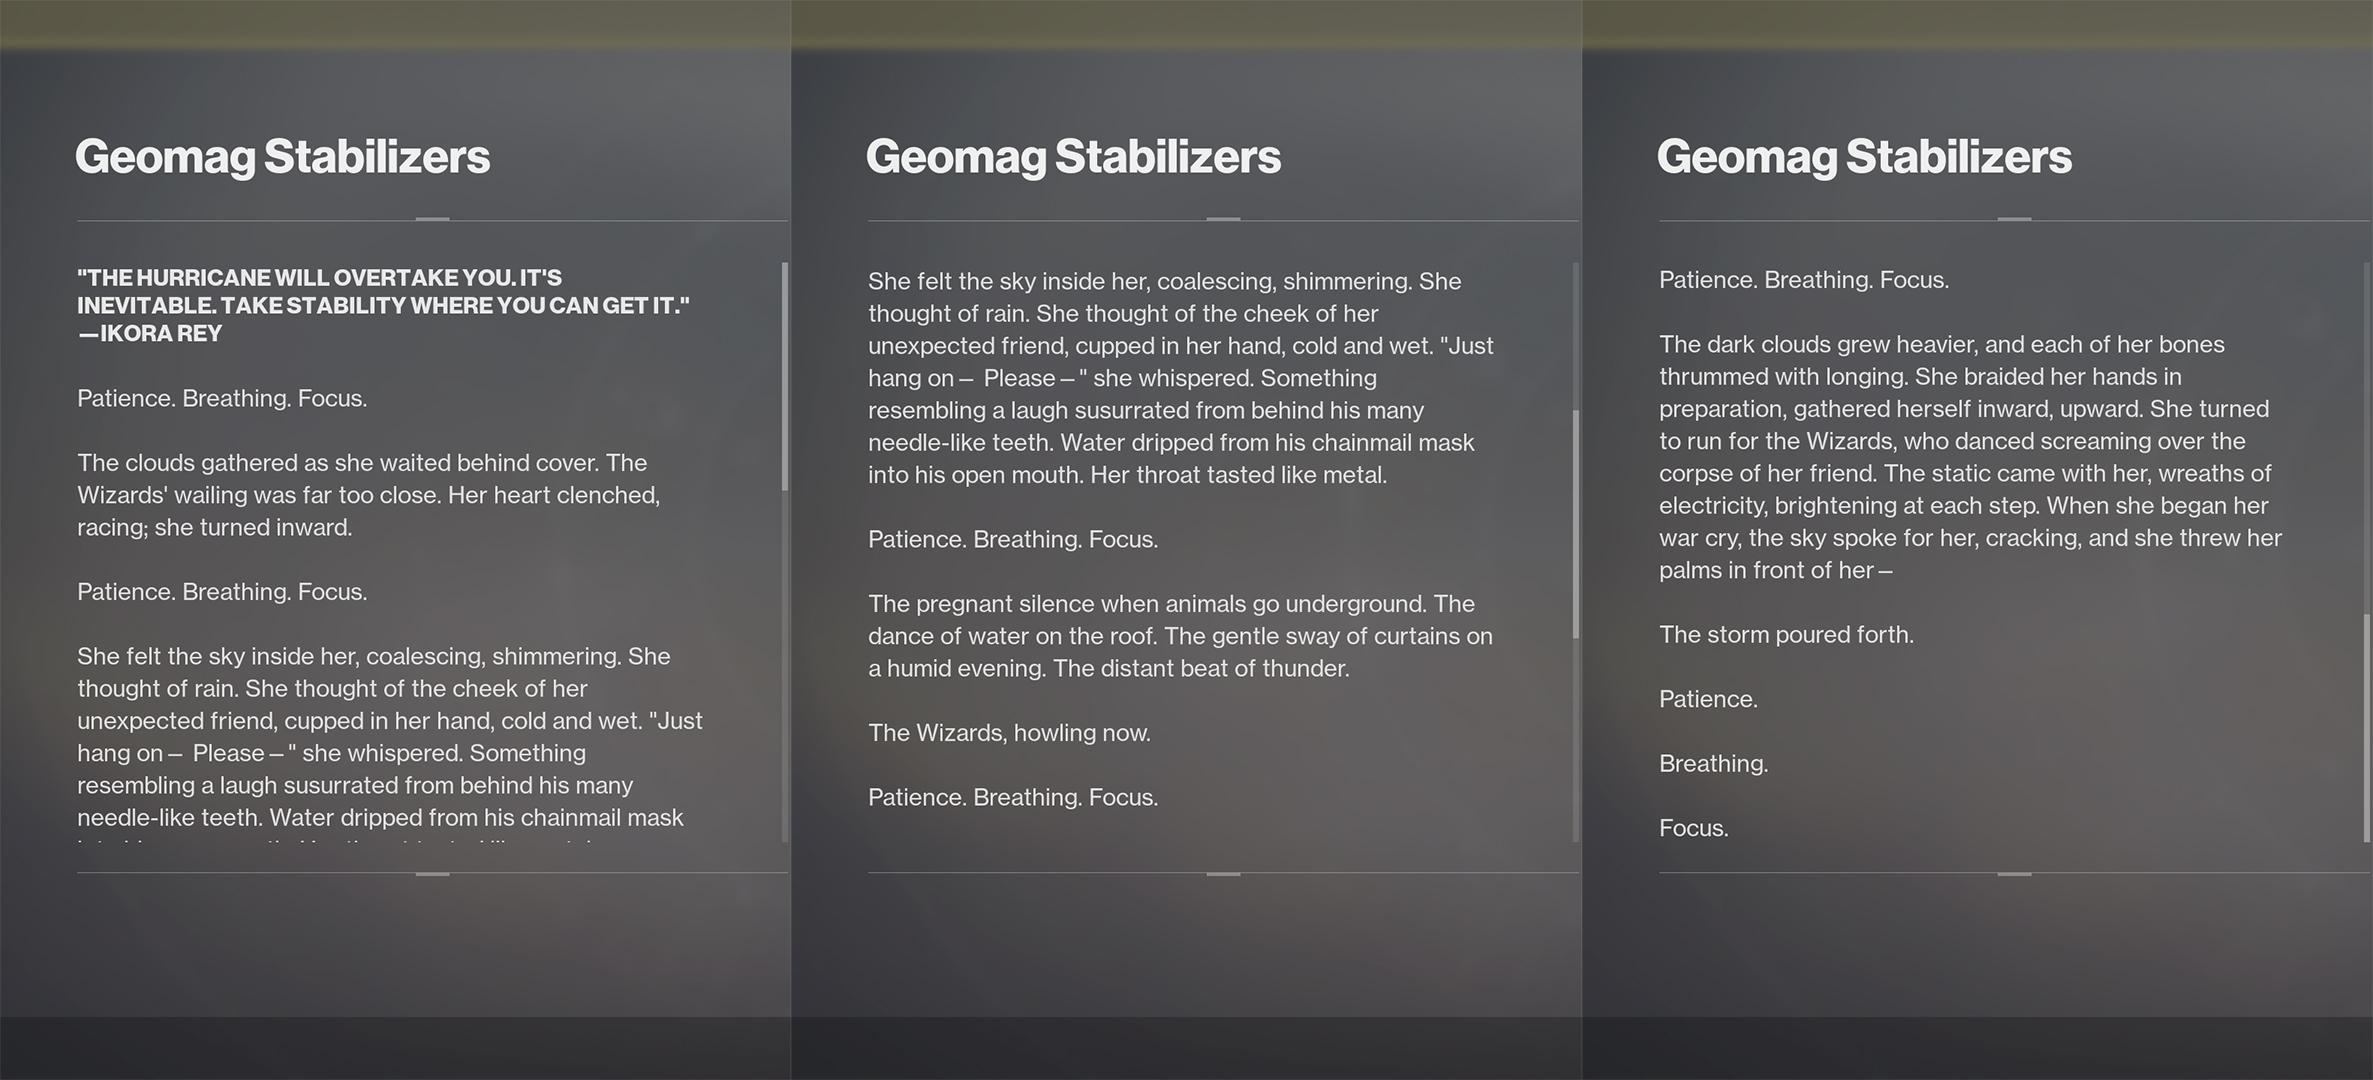 destiny 2 geomag stabilizers lore